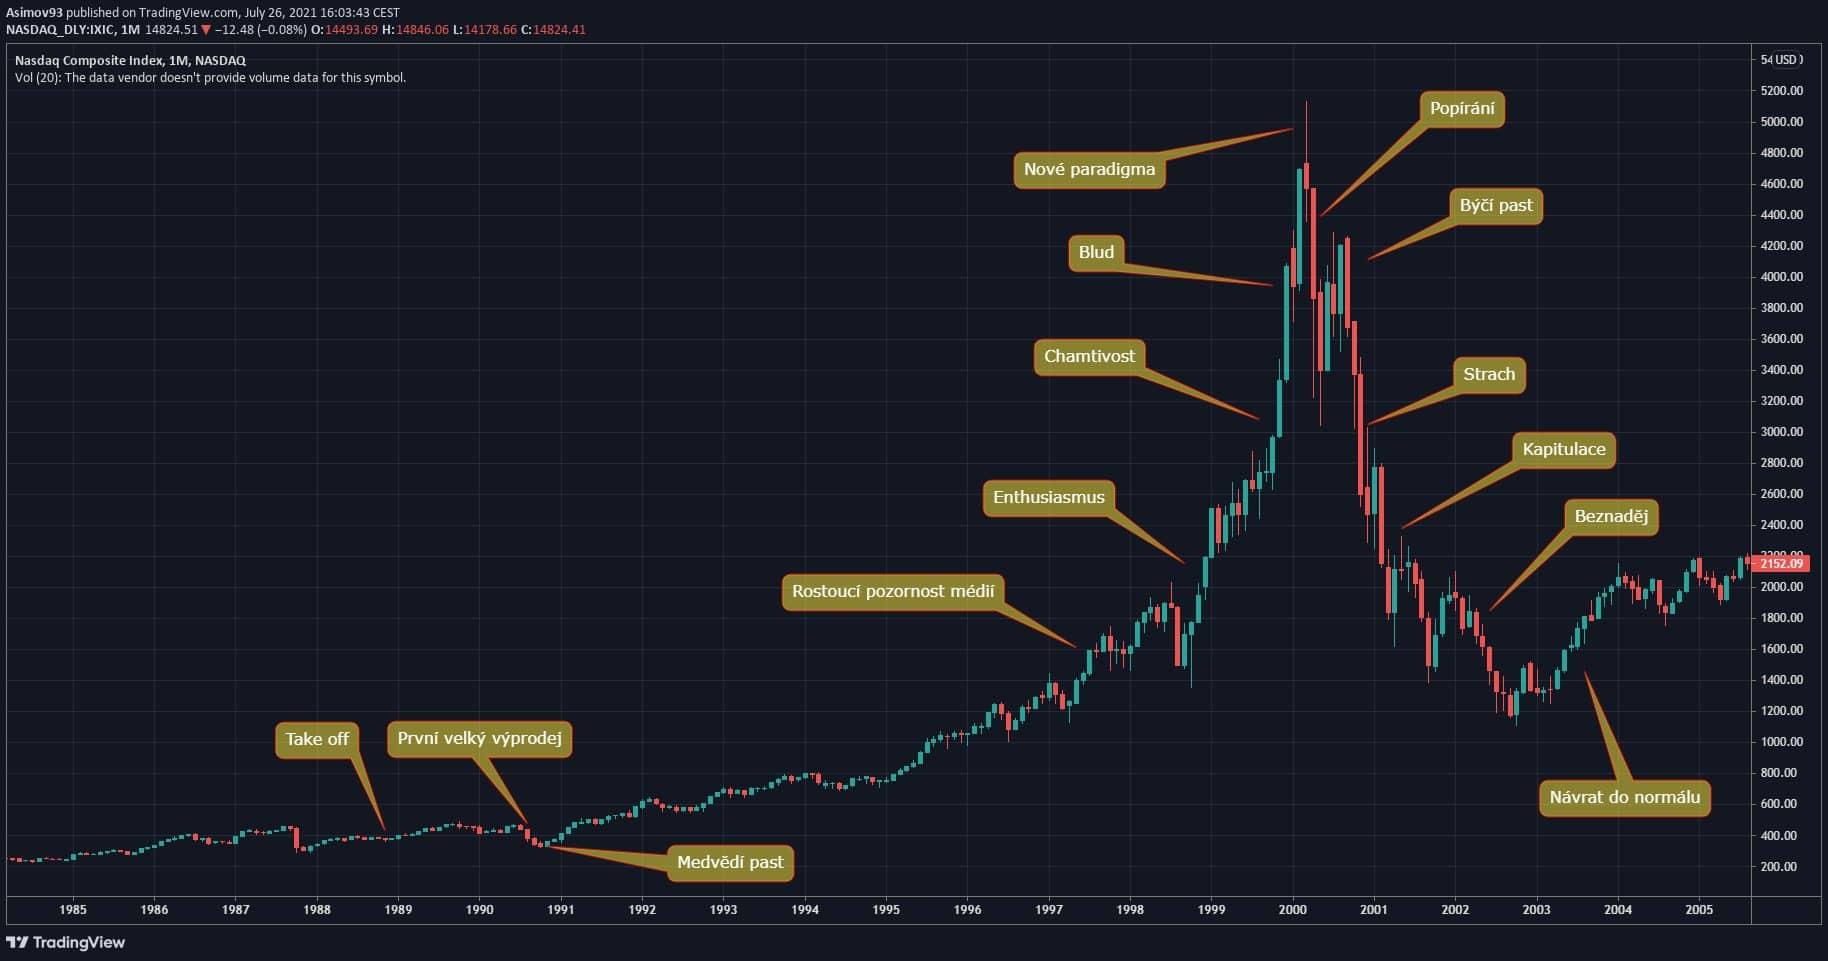 Investiční bublina na Nasdaq, tzv. dotcom bublina